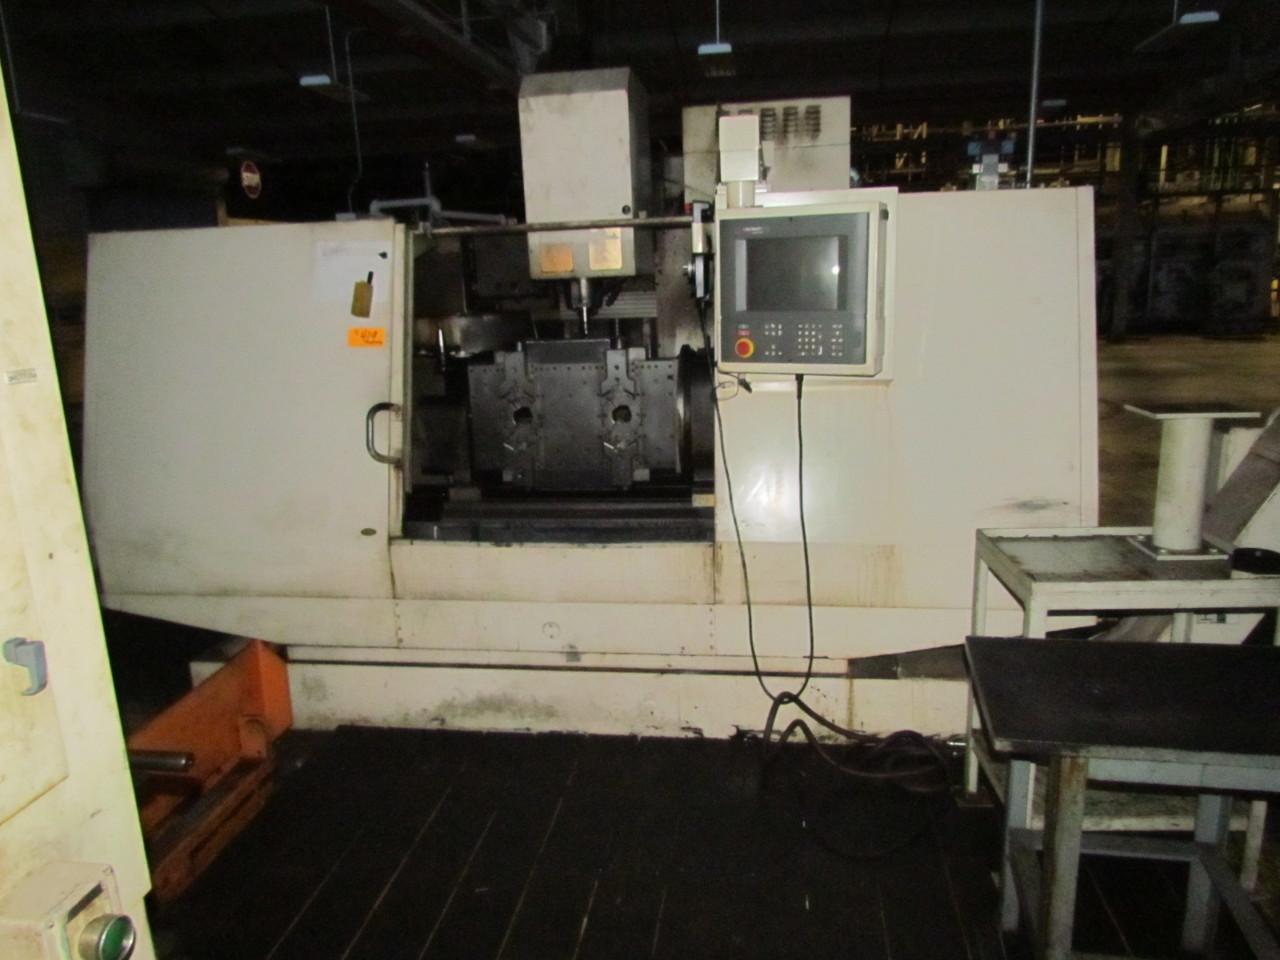 Cincinnati Sabre 1000 ERO Vertical Machining Center 20x44